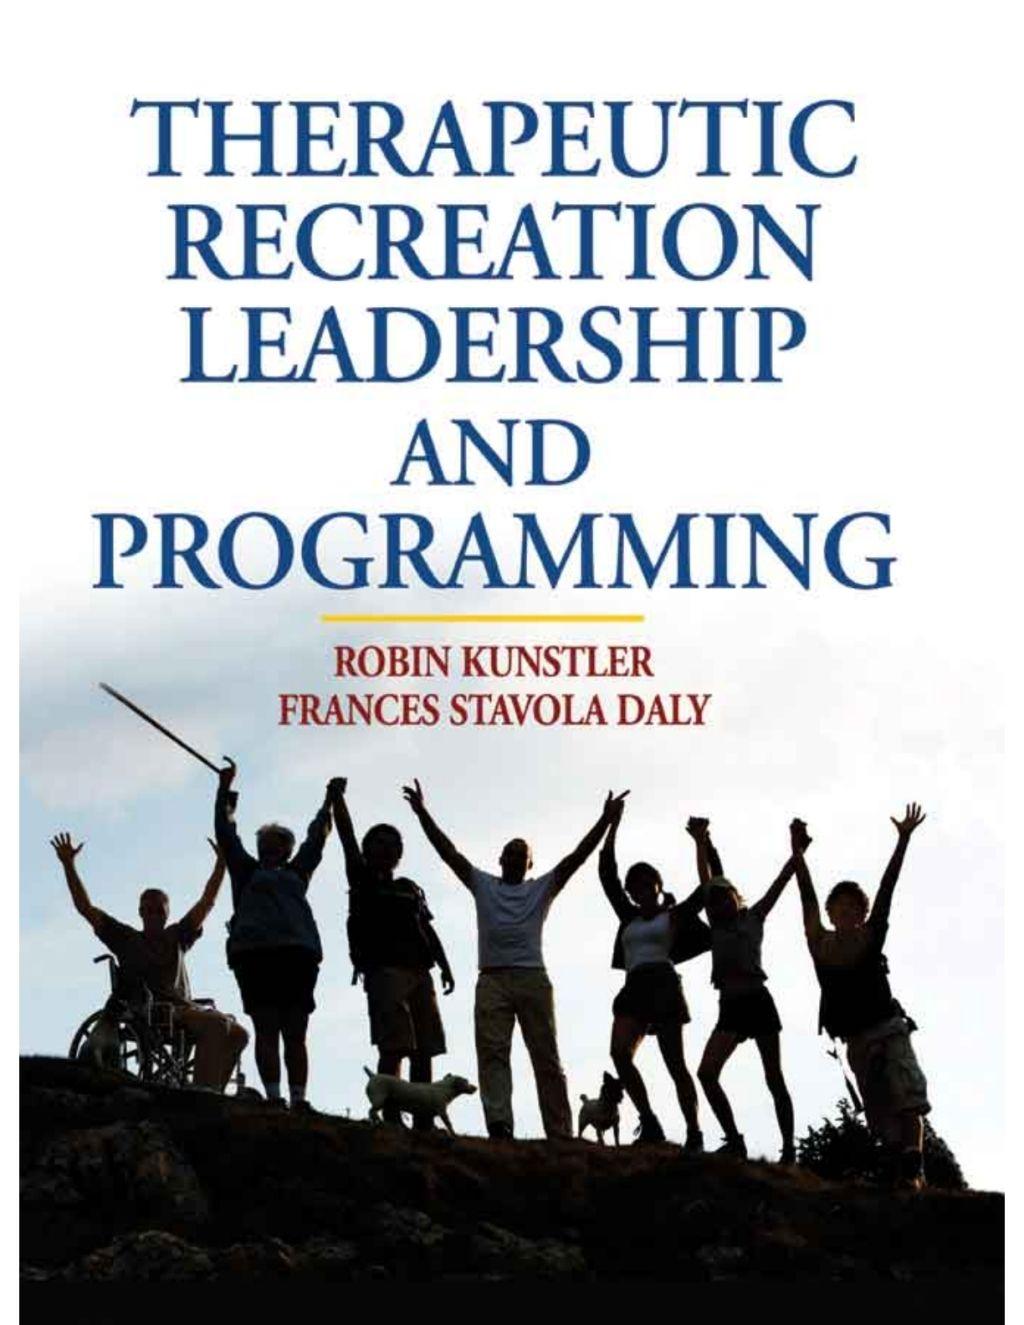 The Utic Recreation Leadership And Programming Ebook